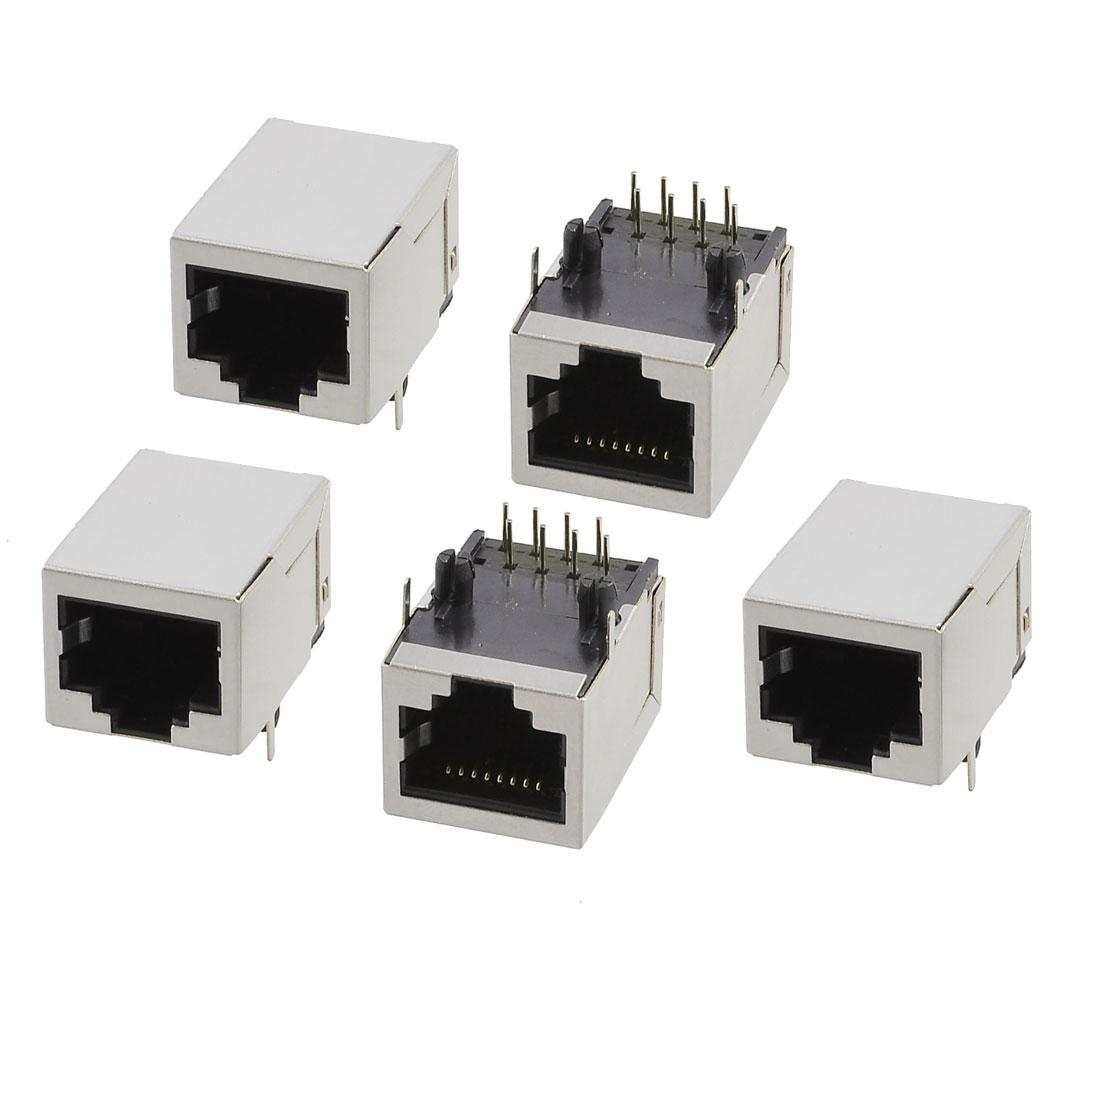 5 Pcs Shielded 8 Pins Network RJ45 Modular PCB Jacks